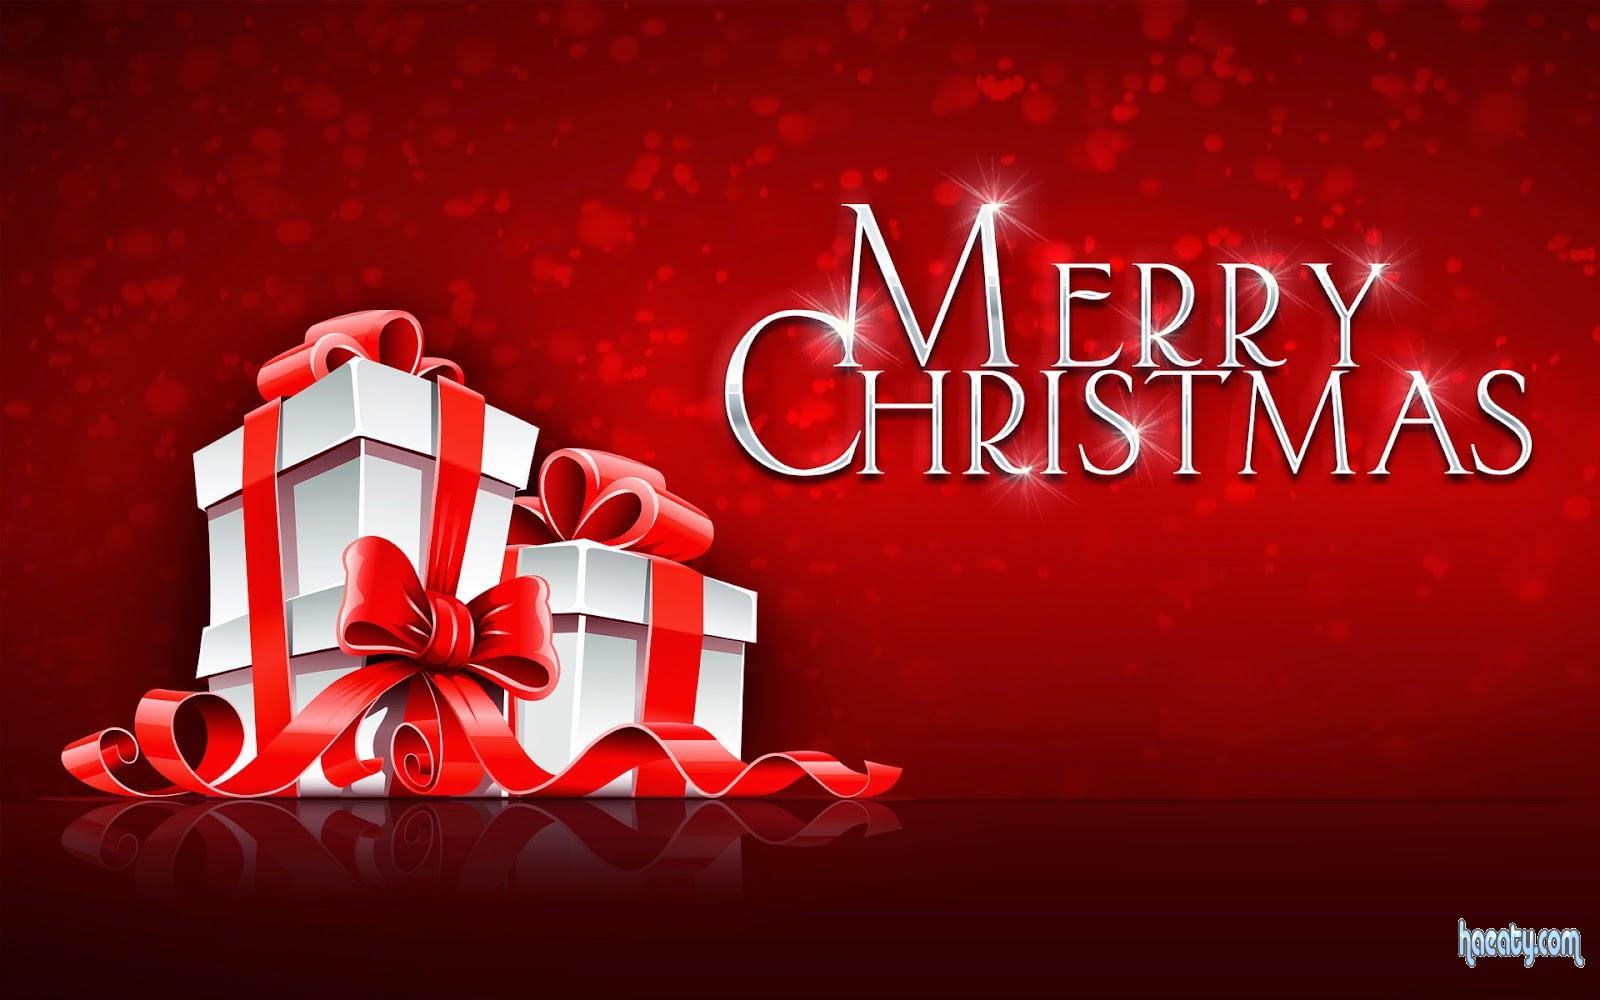 الكريسماس 2016-Merry-Christmas-and-Happy-new-year-2016 1450540949271.jpg